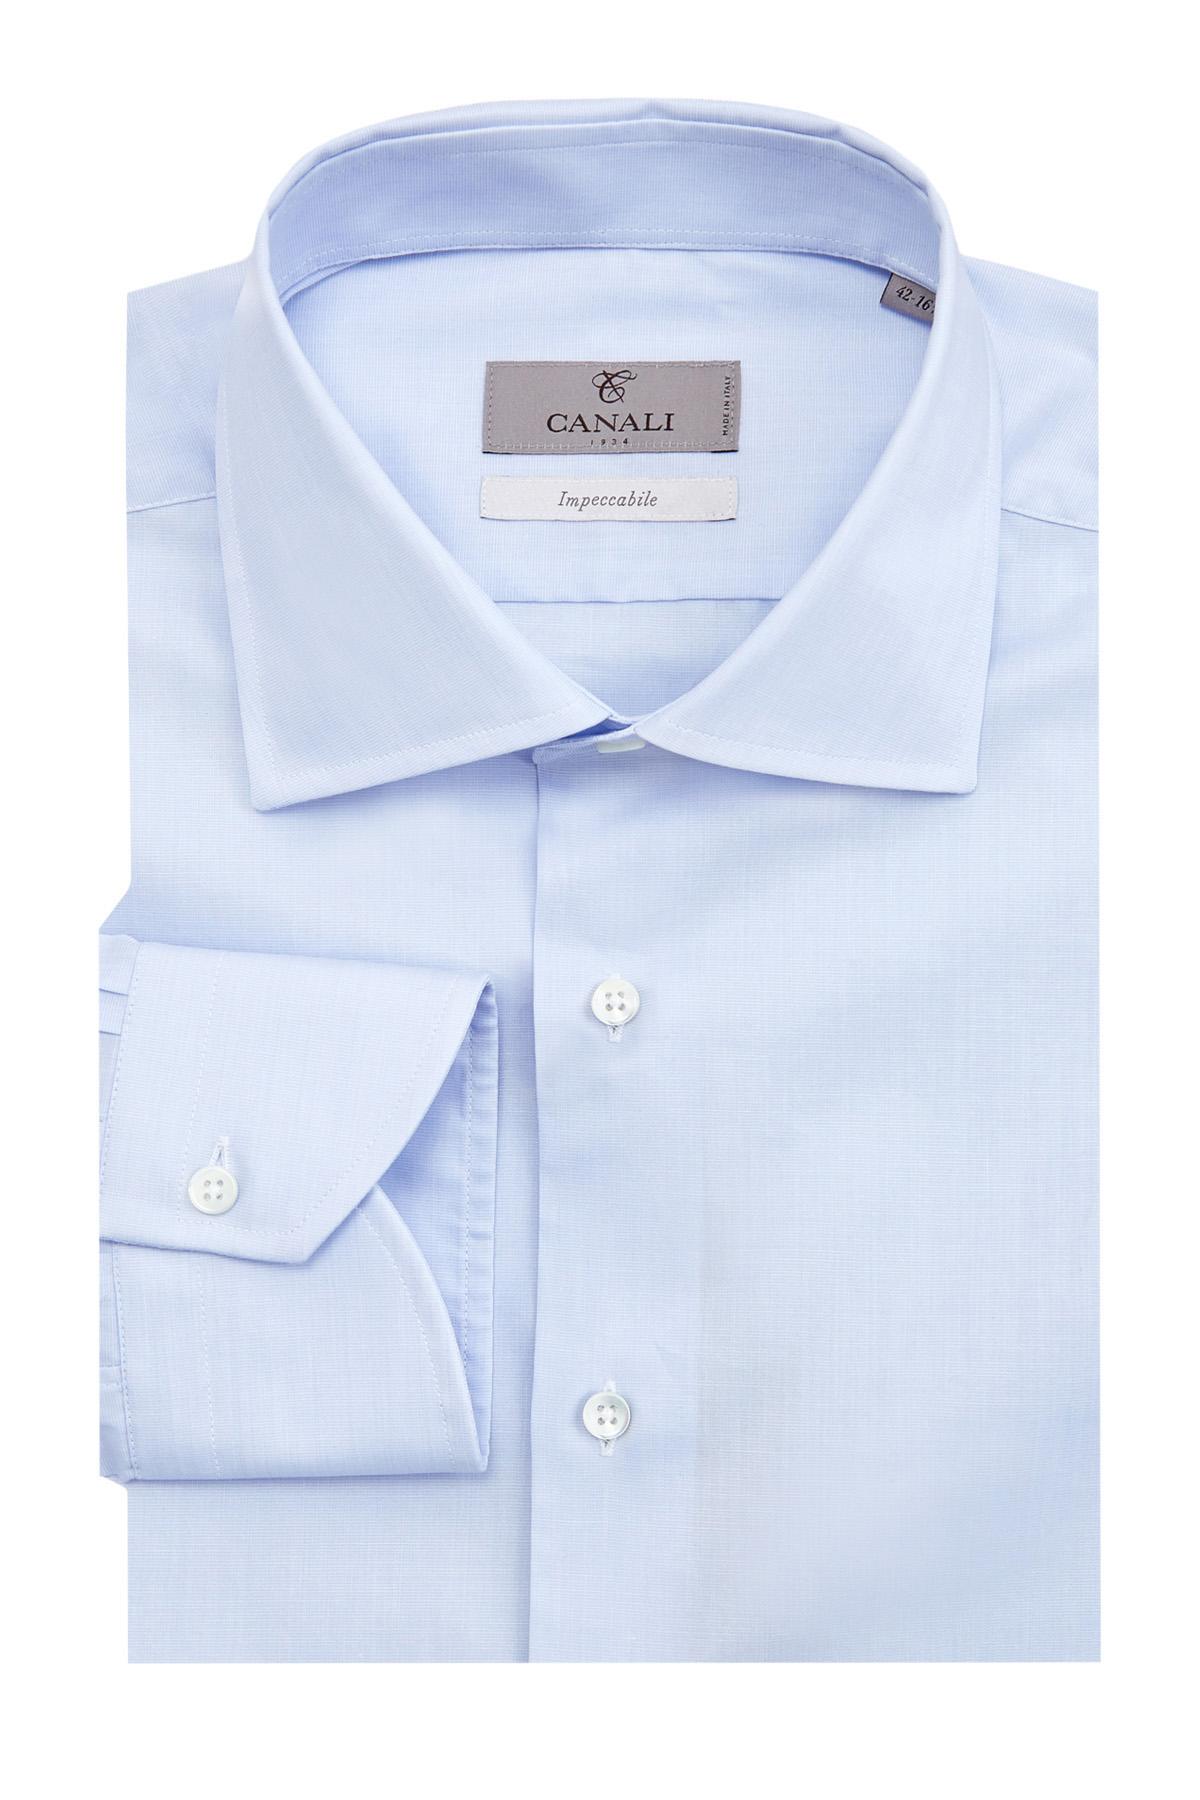 Однотонная рубашка Modern Fit из хлопка Impeccabile